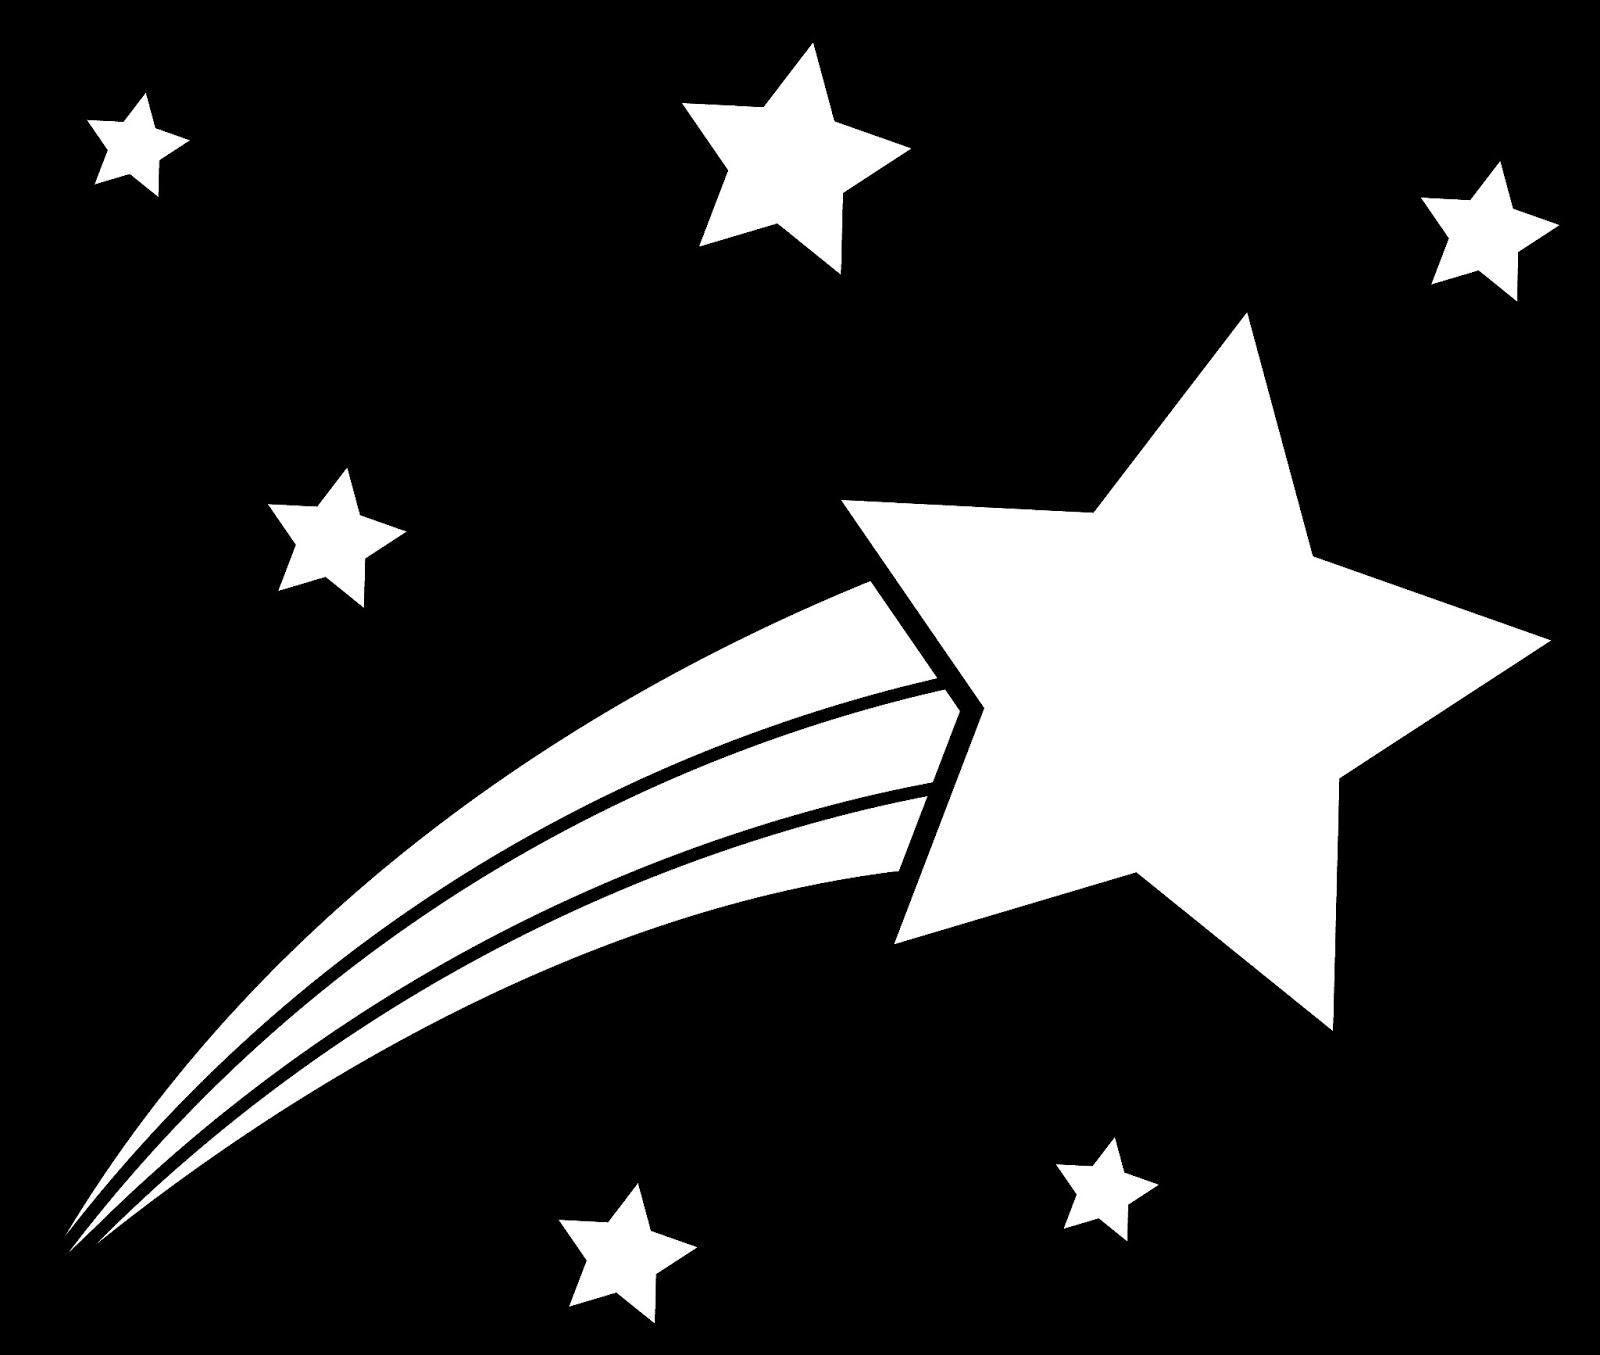 Shooting star transparent clipart 2